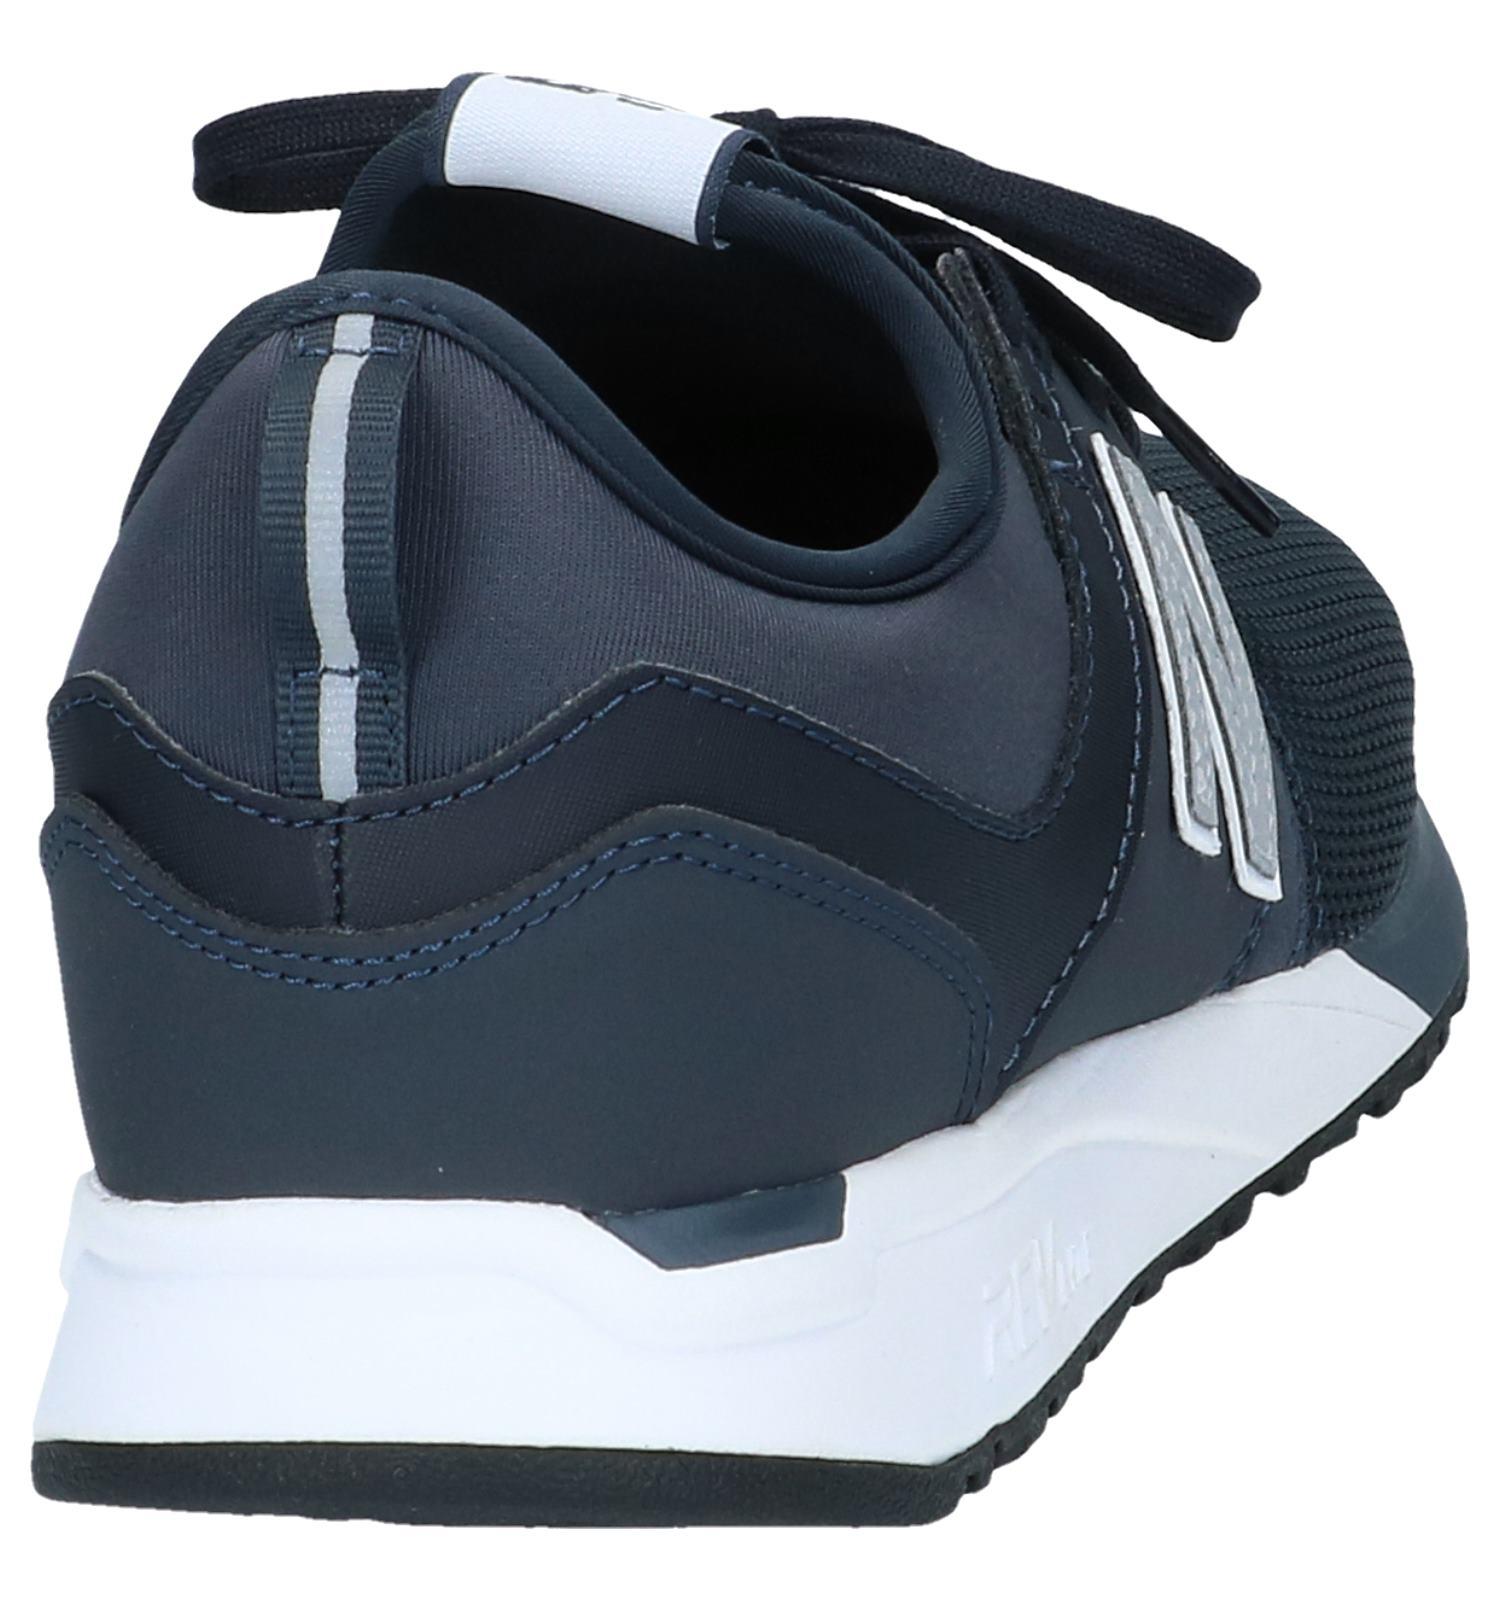 Sneakers 247 Blauw Balance New Mrl wnk80POX